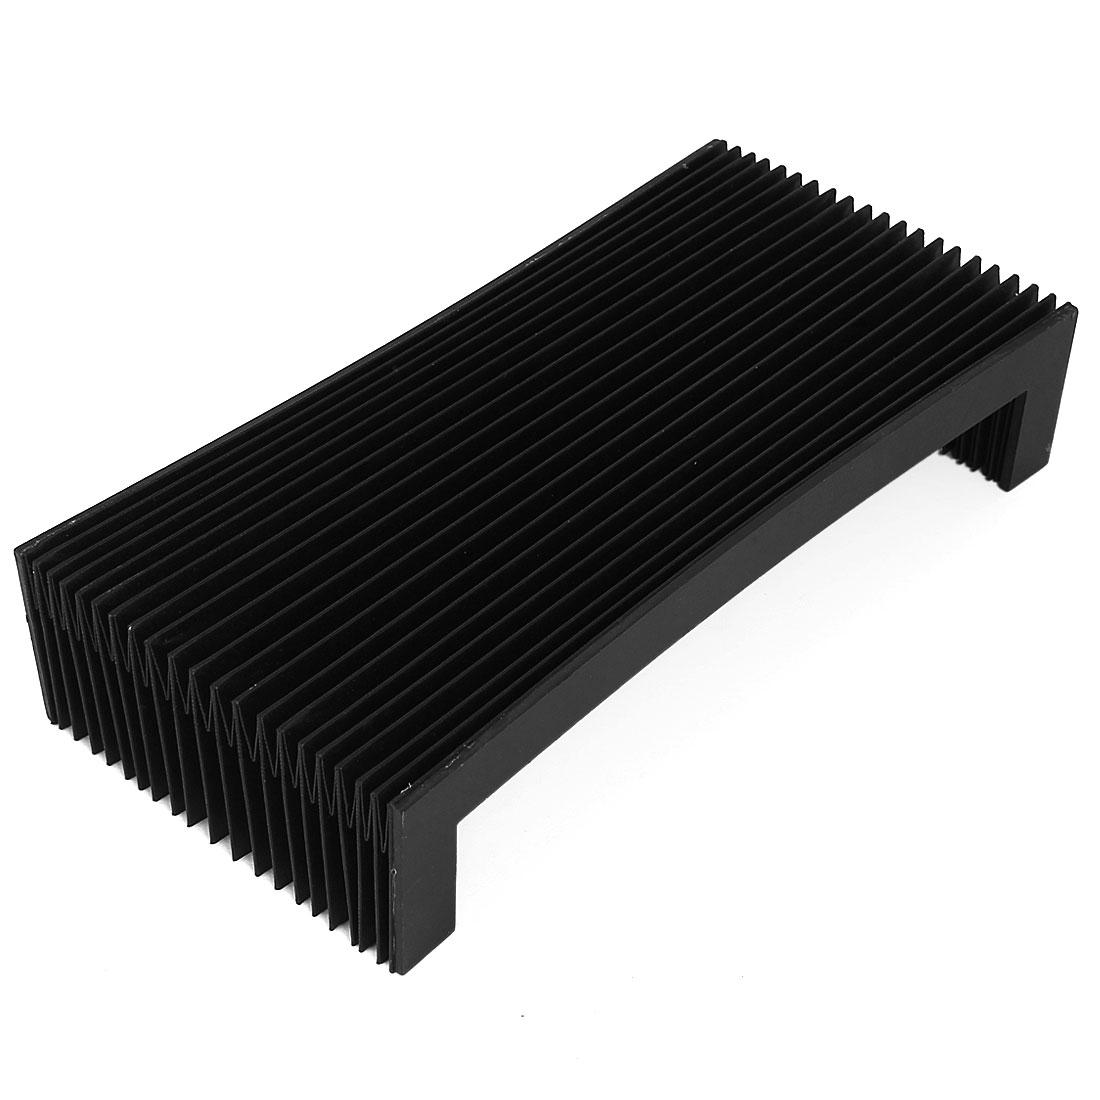 CNC Machine Fitting Foldable Dust Protective Cover Black 52cmx28cmx6cm